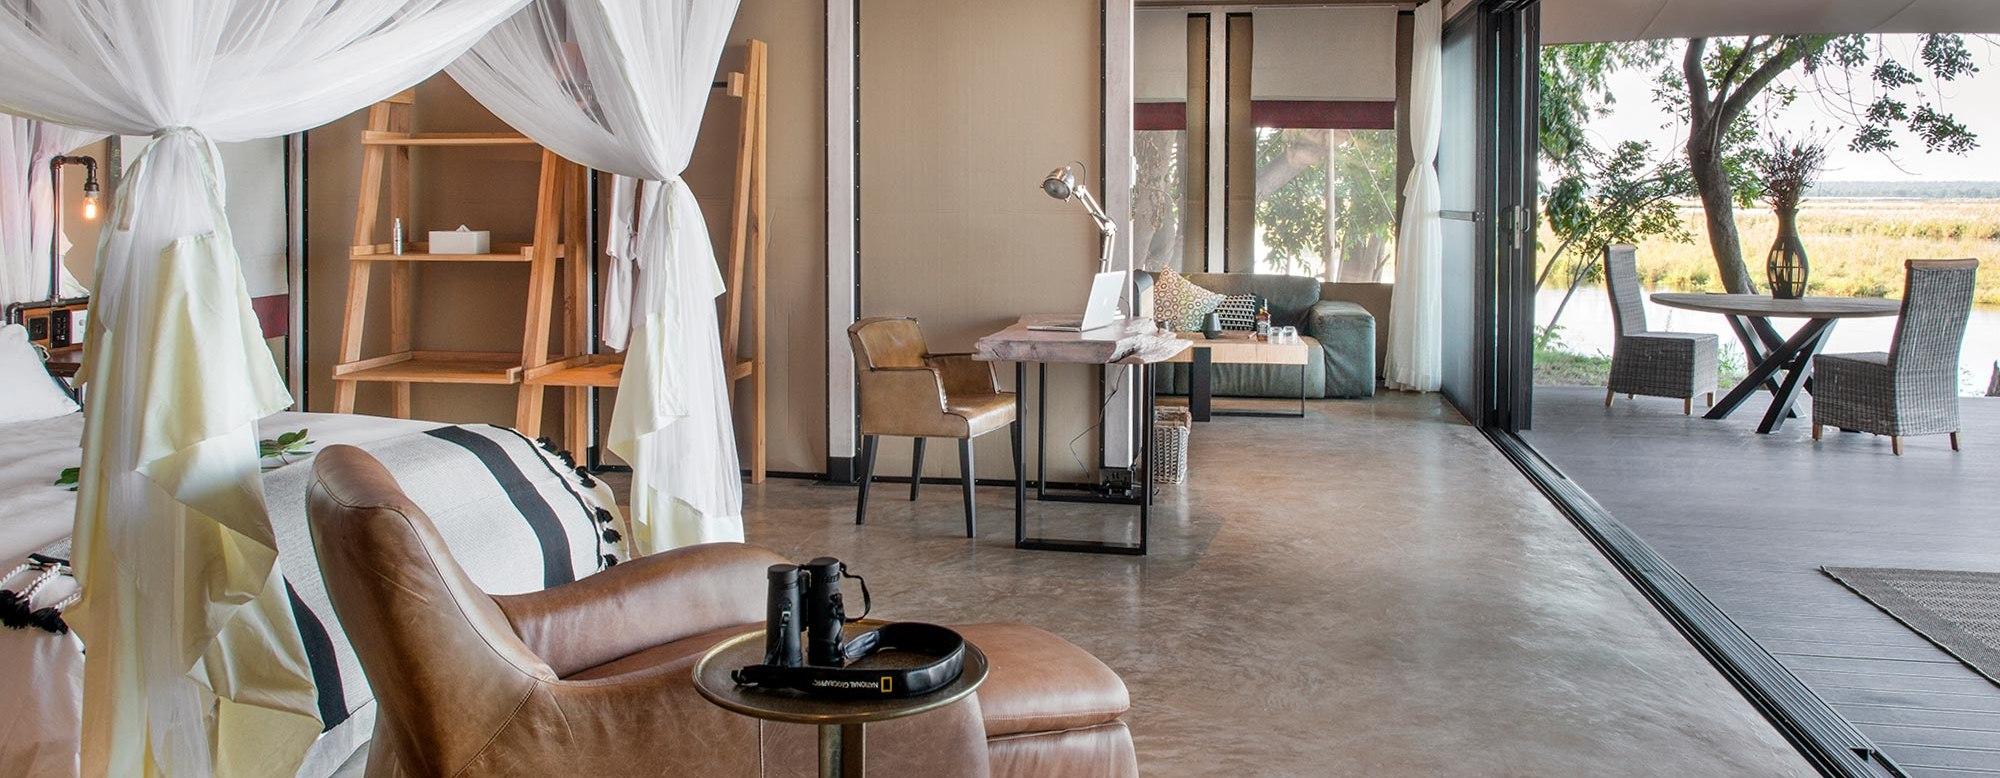 sausage-tree-camp-suite-interior